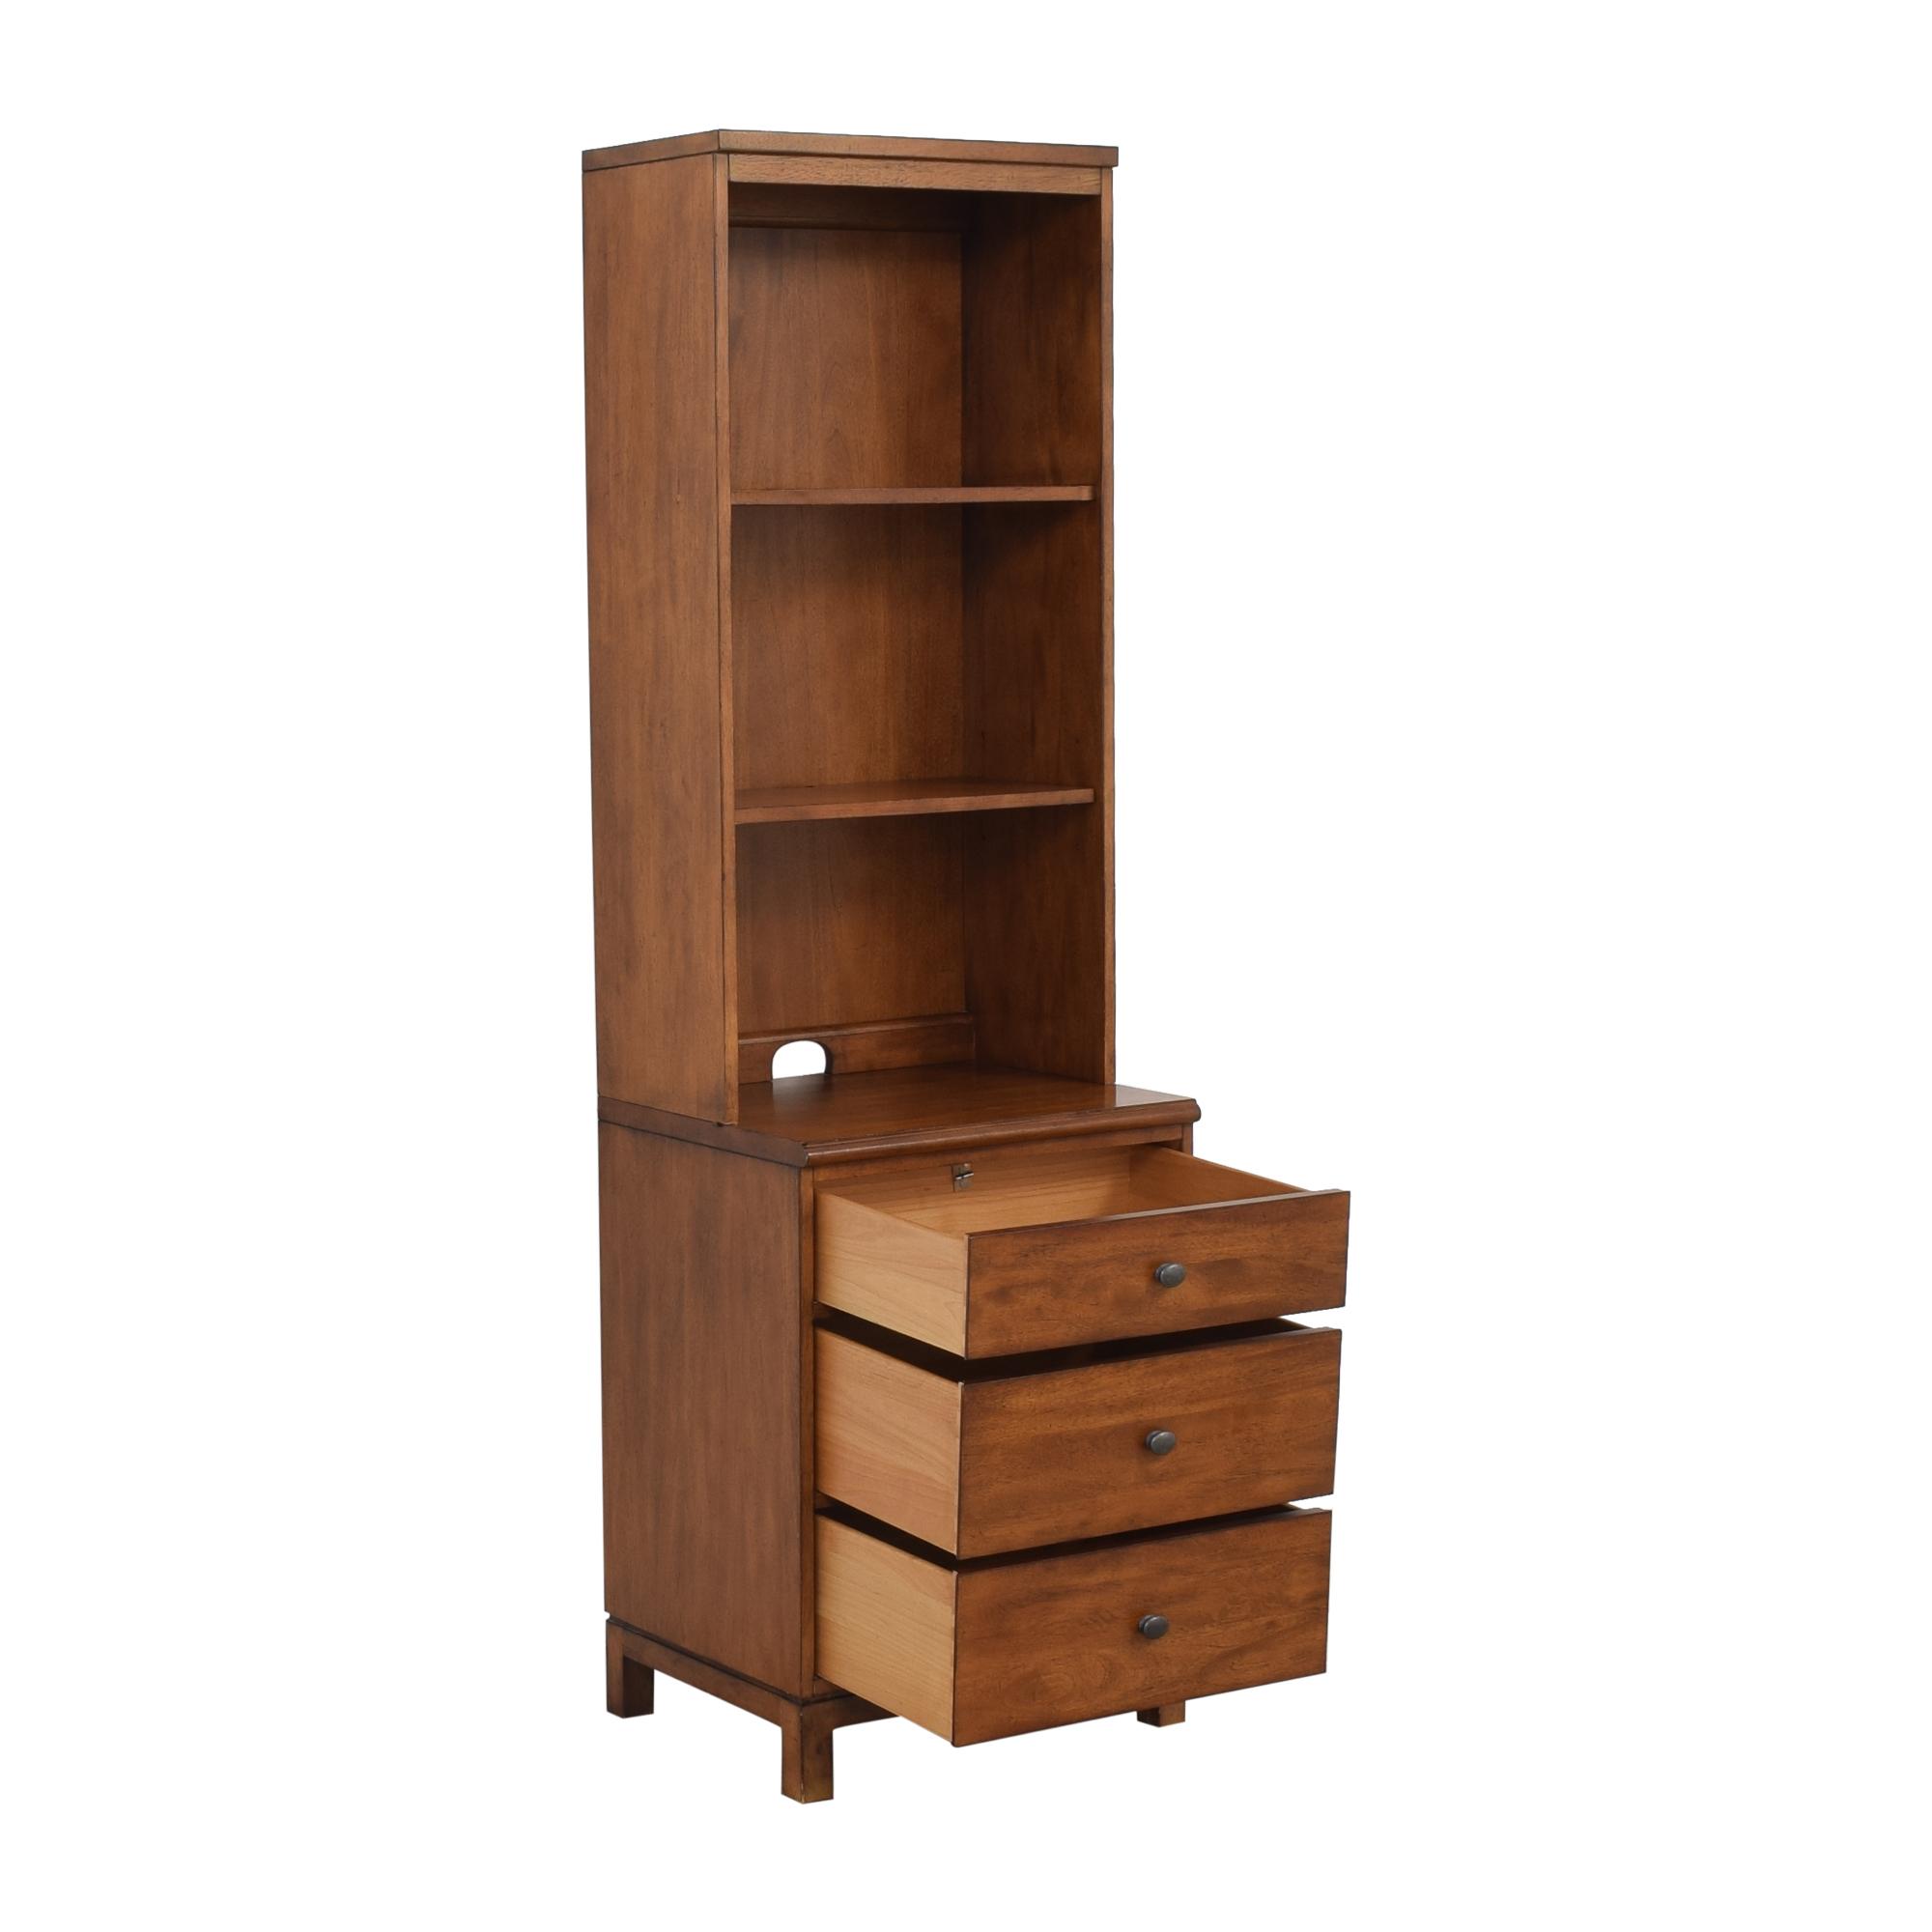 Ethan Allen Ethan Allen Wall Unit Bookcases & Shelving